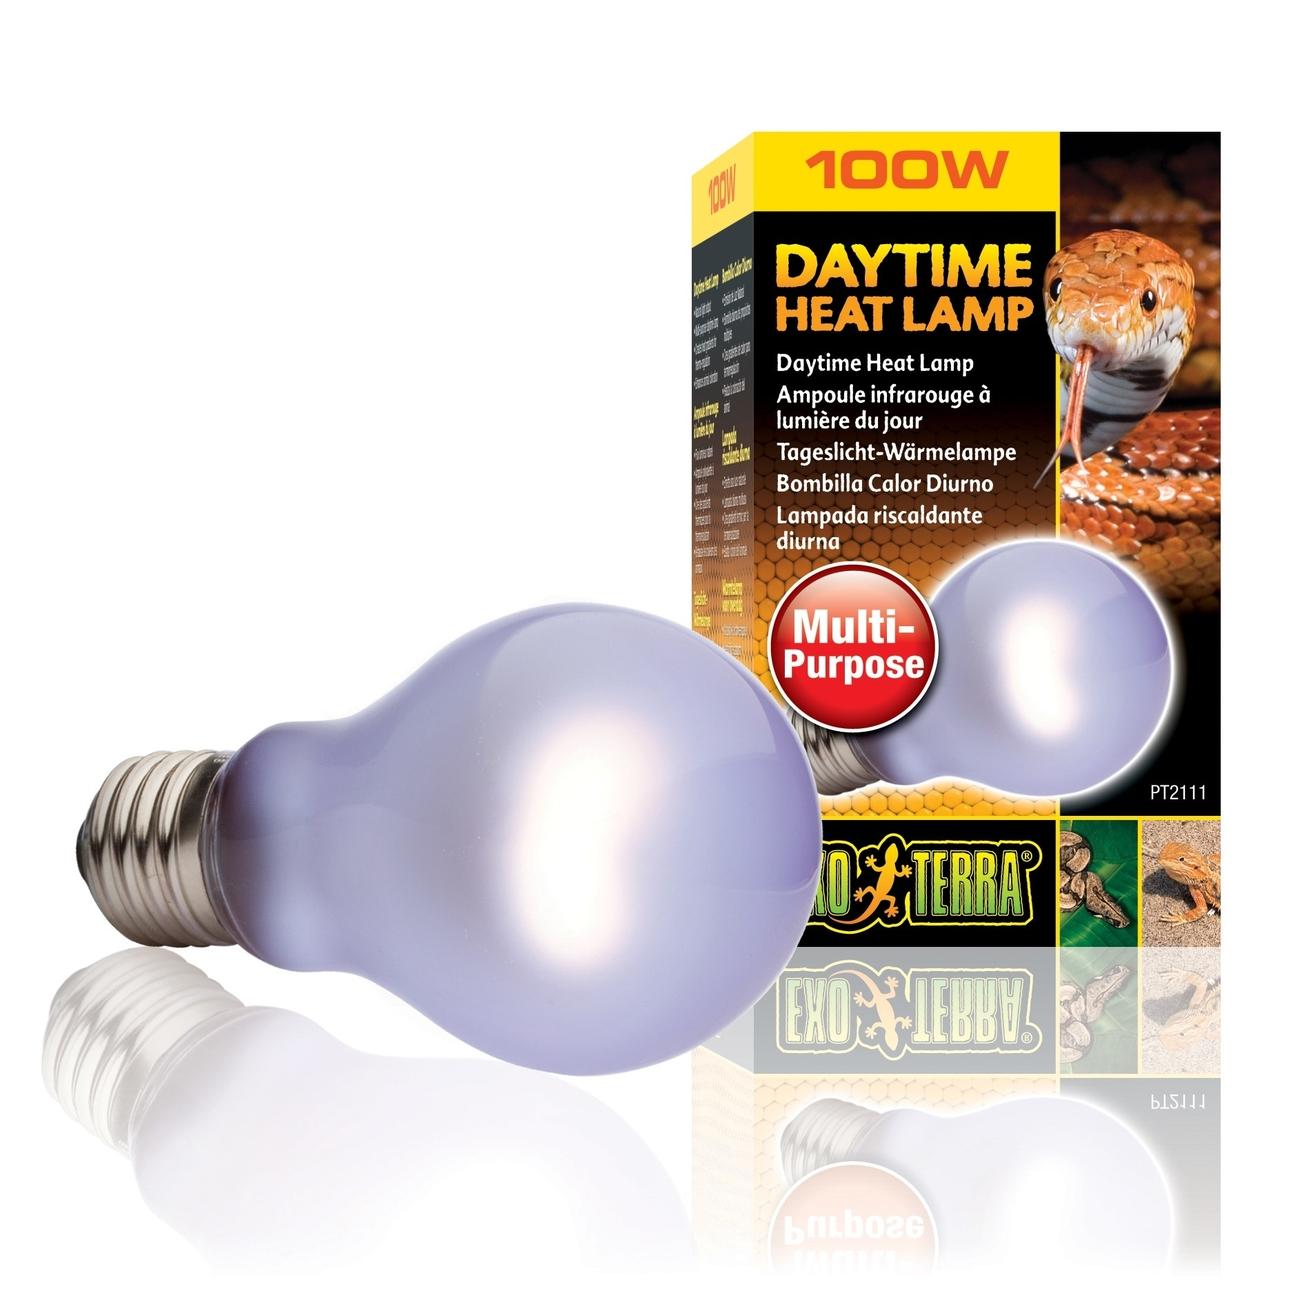 Exo Terra - Daytime Heat Lampe, Bild 11